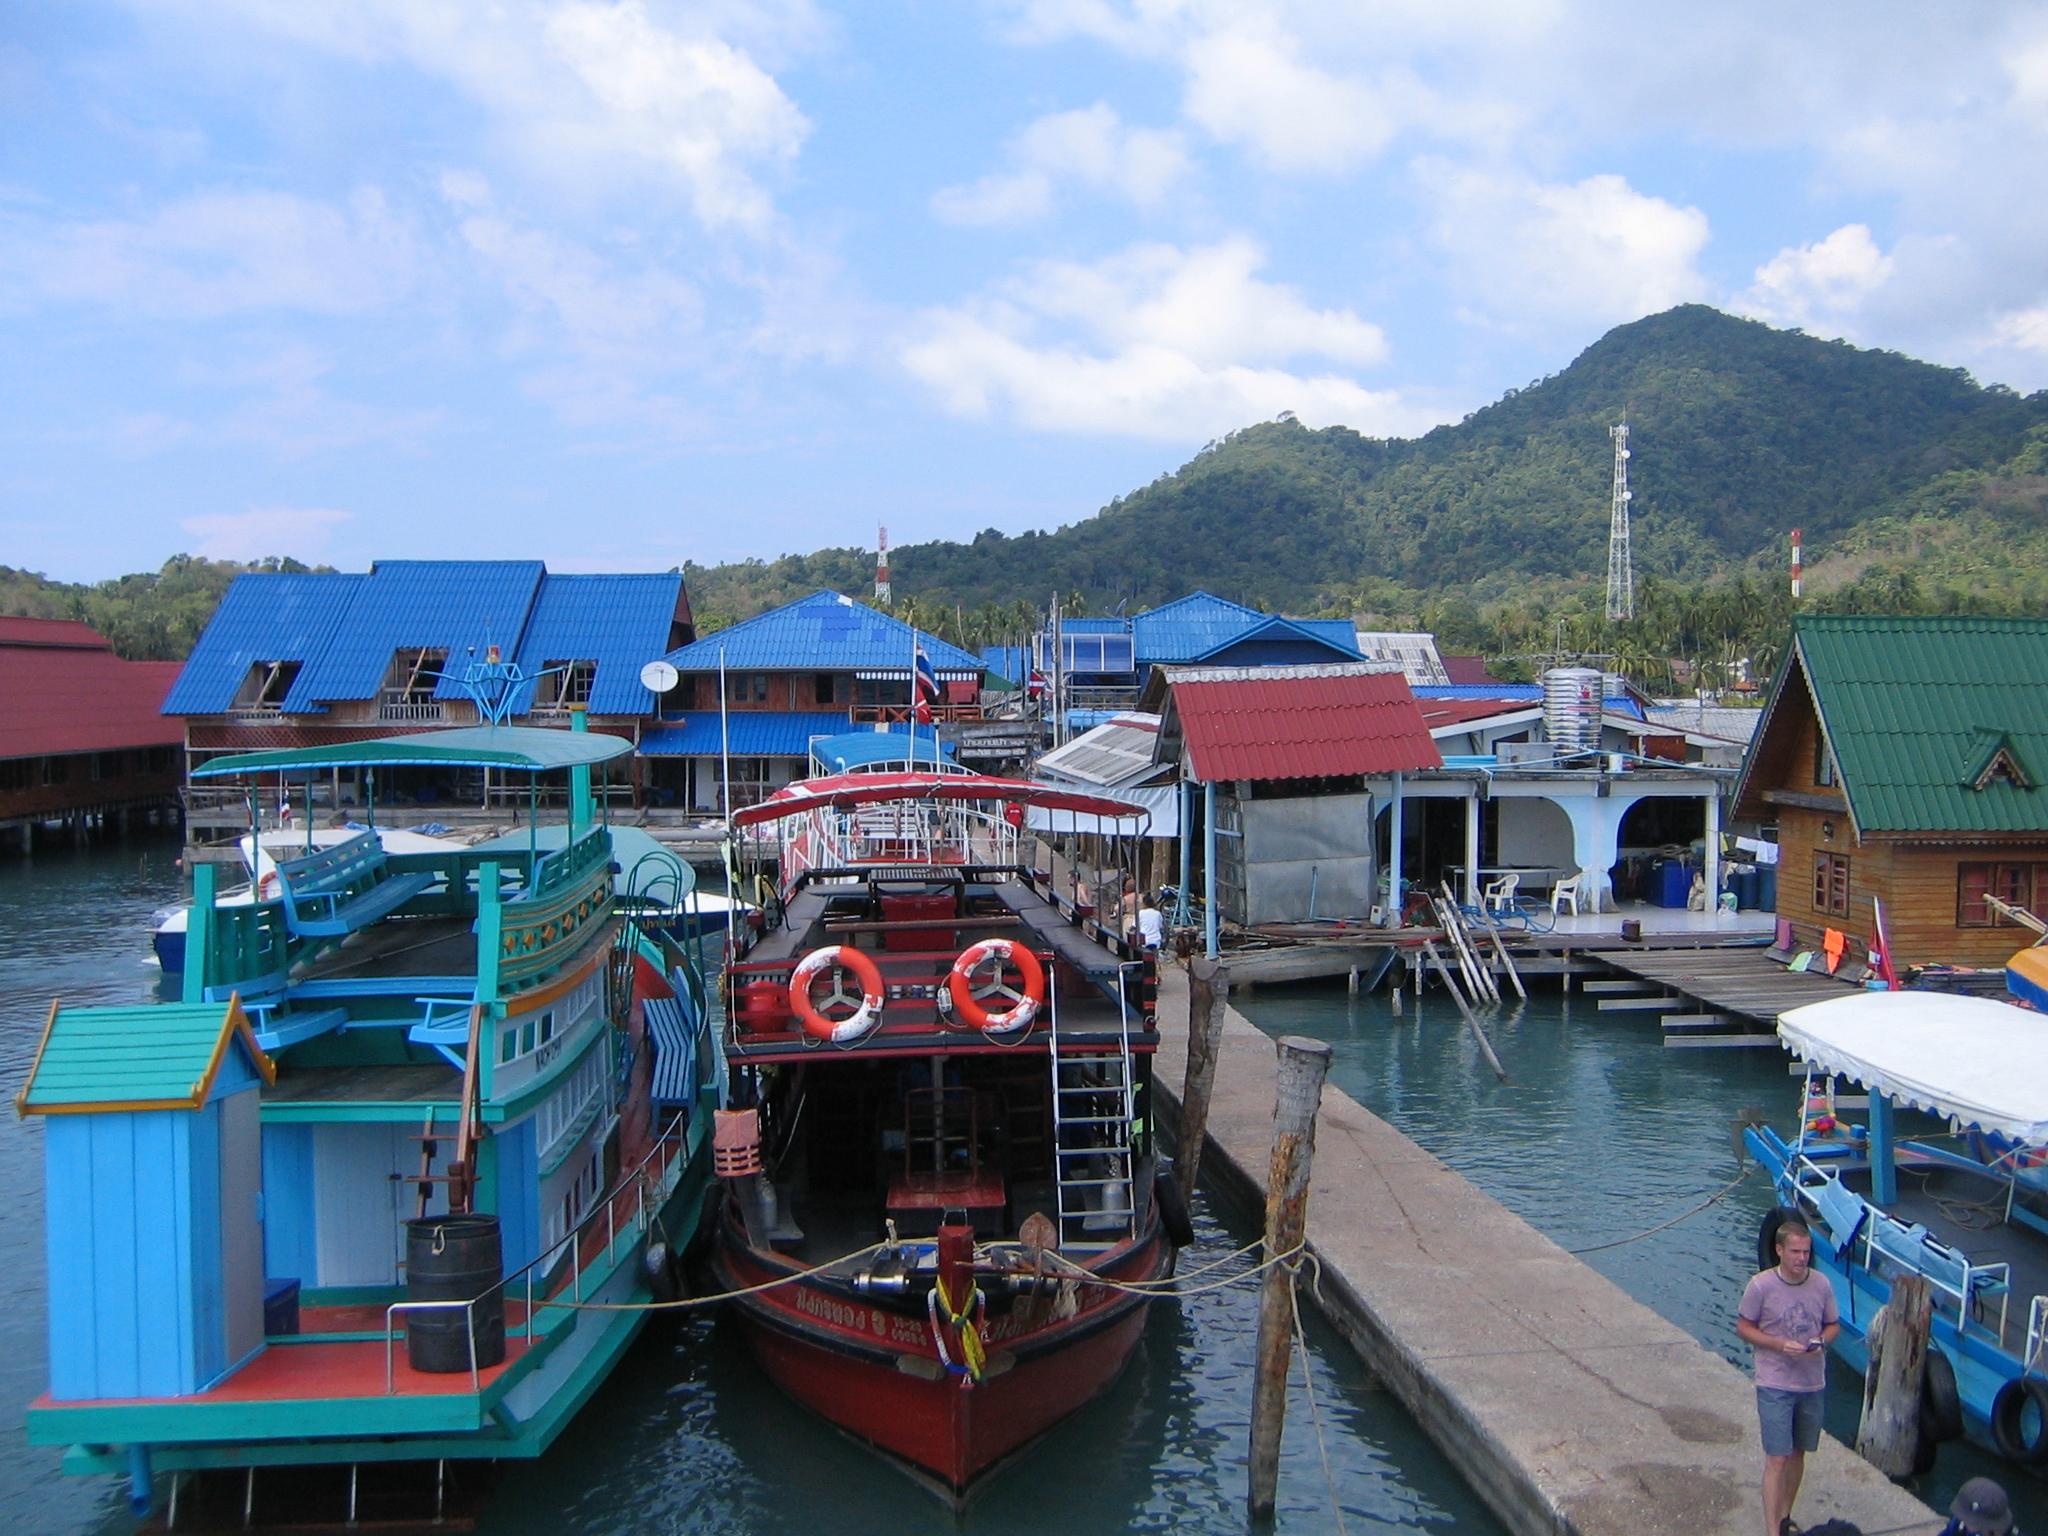 Boats in bangbao photo